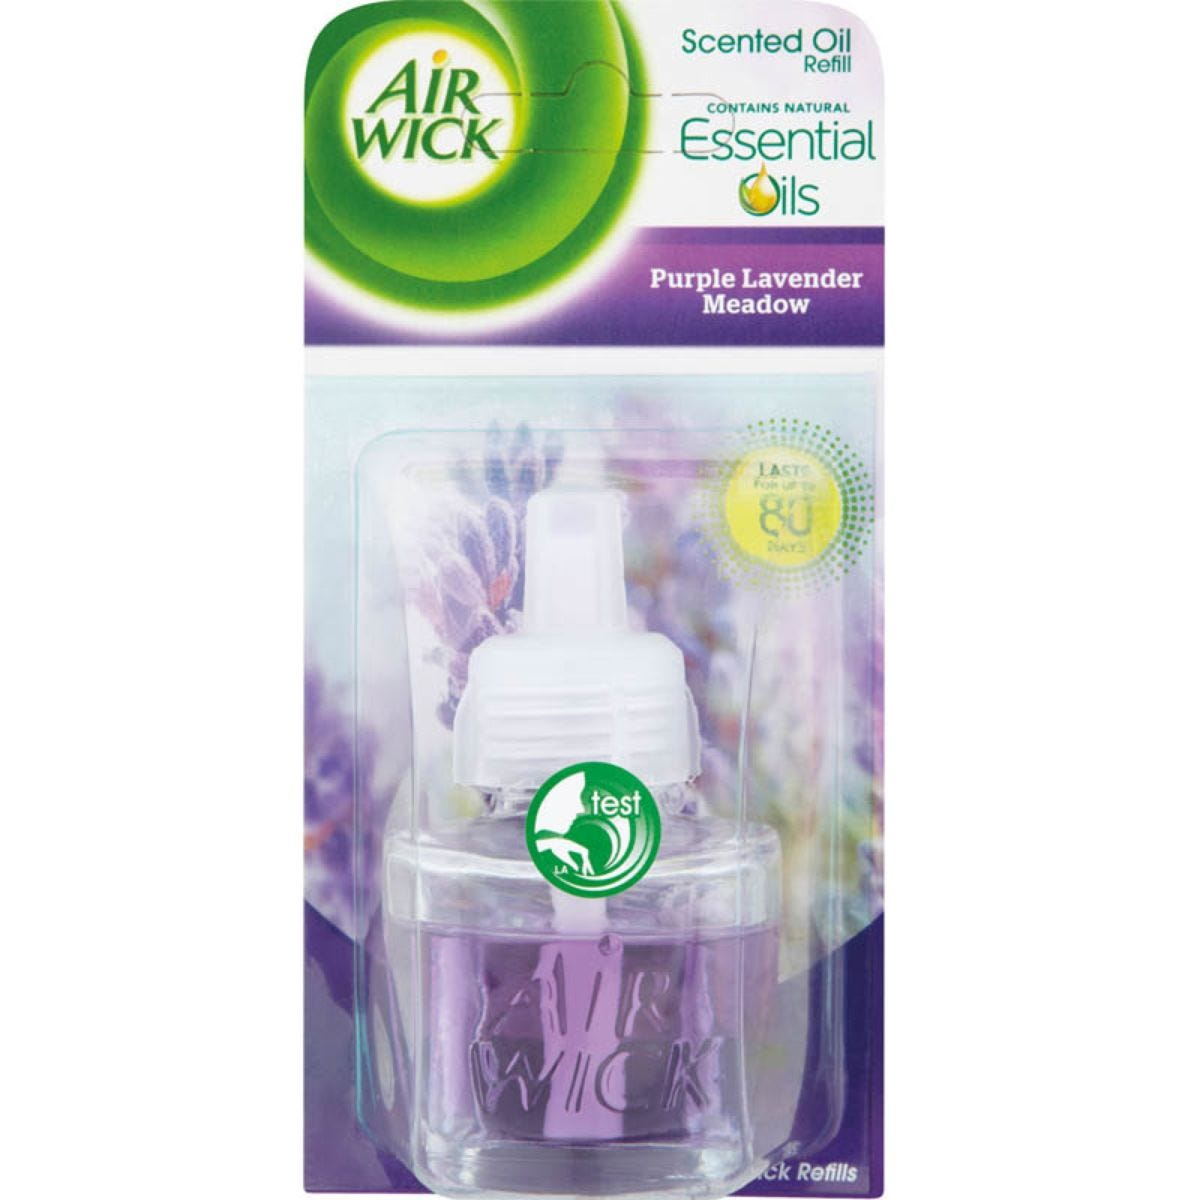 Airwick Purple Meadow Lavender Electric Refill